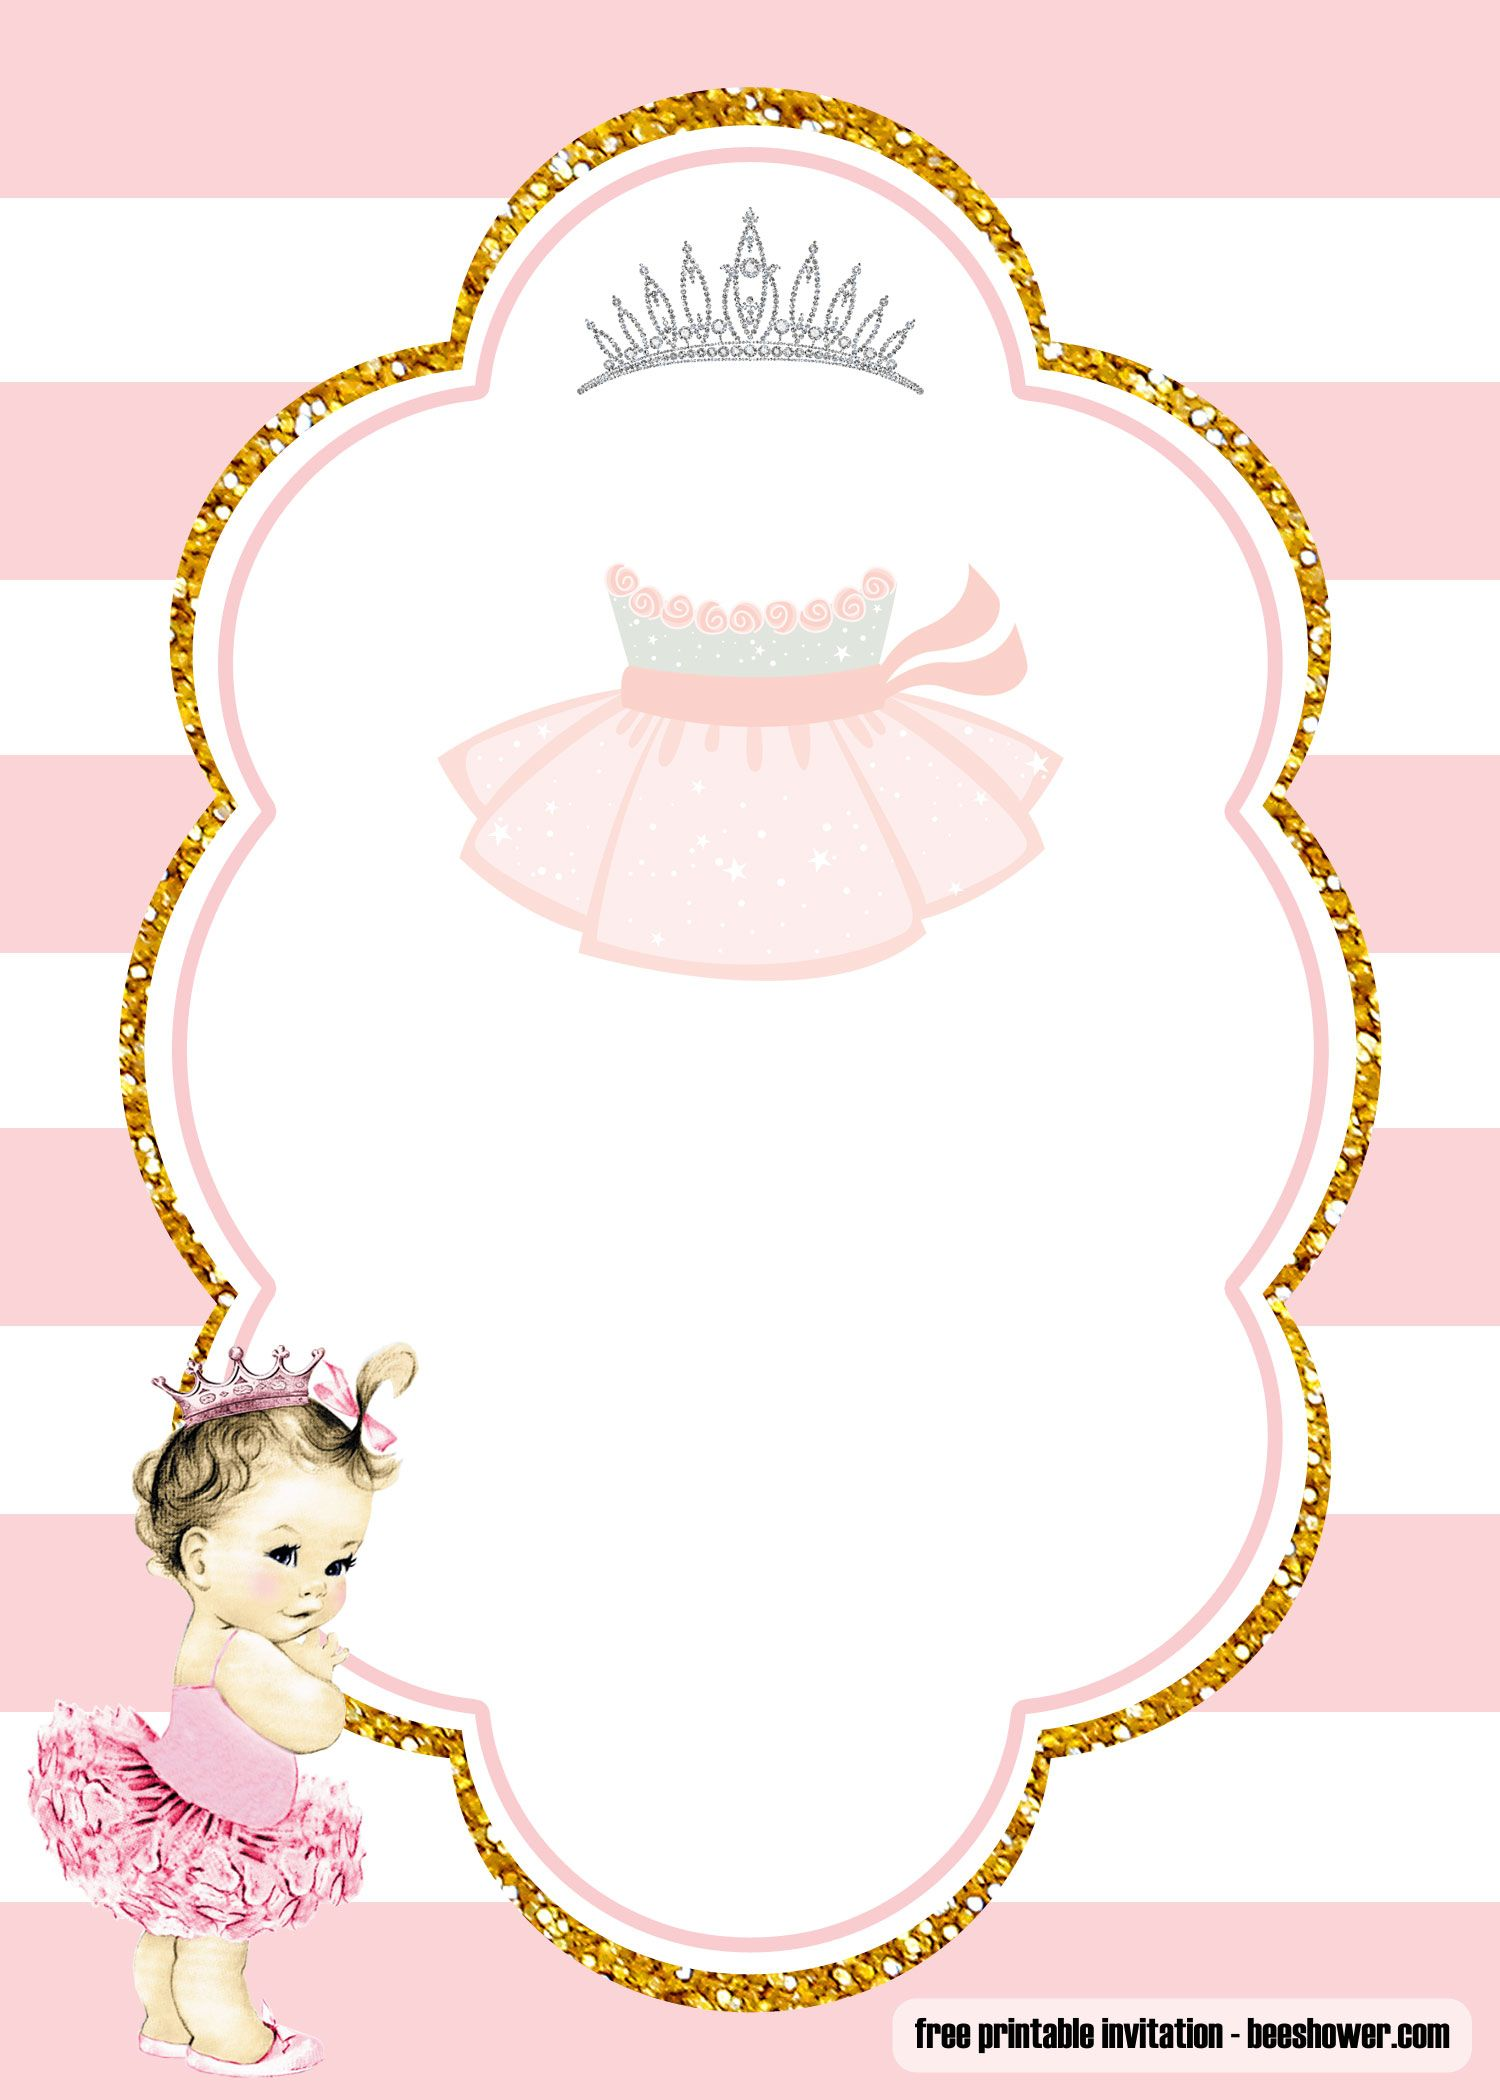 Free Ballerina Baby Shower Invitations Templates Ballerina Baby Shower Invitations Printable Baby Shower Invitations Ballerina Baby Showers